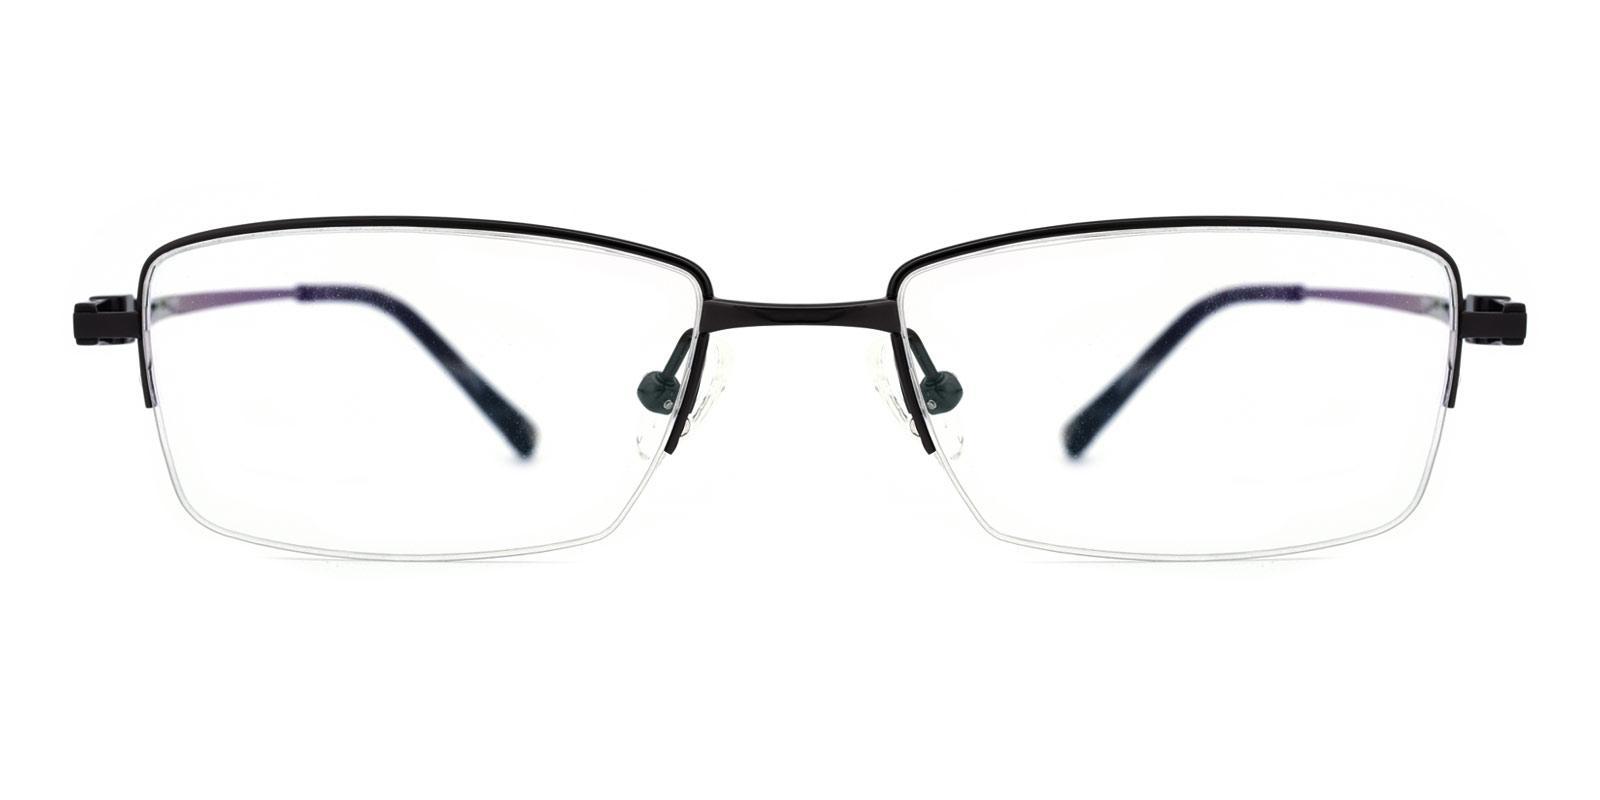 Beau-Black-Rectangle-Titanium-Eyeglasses-detail